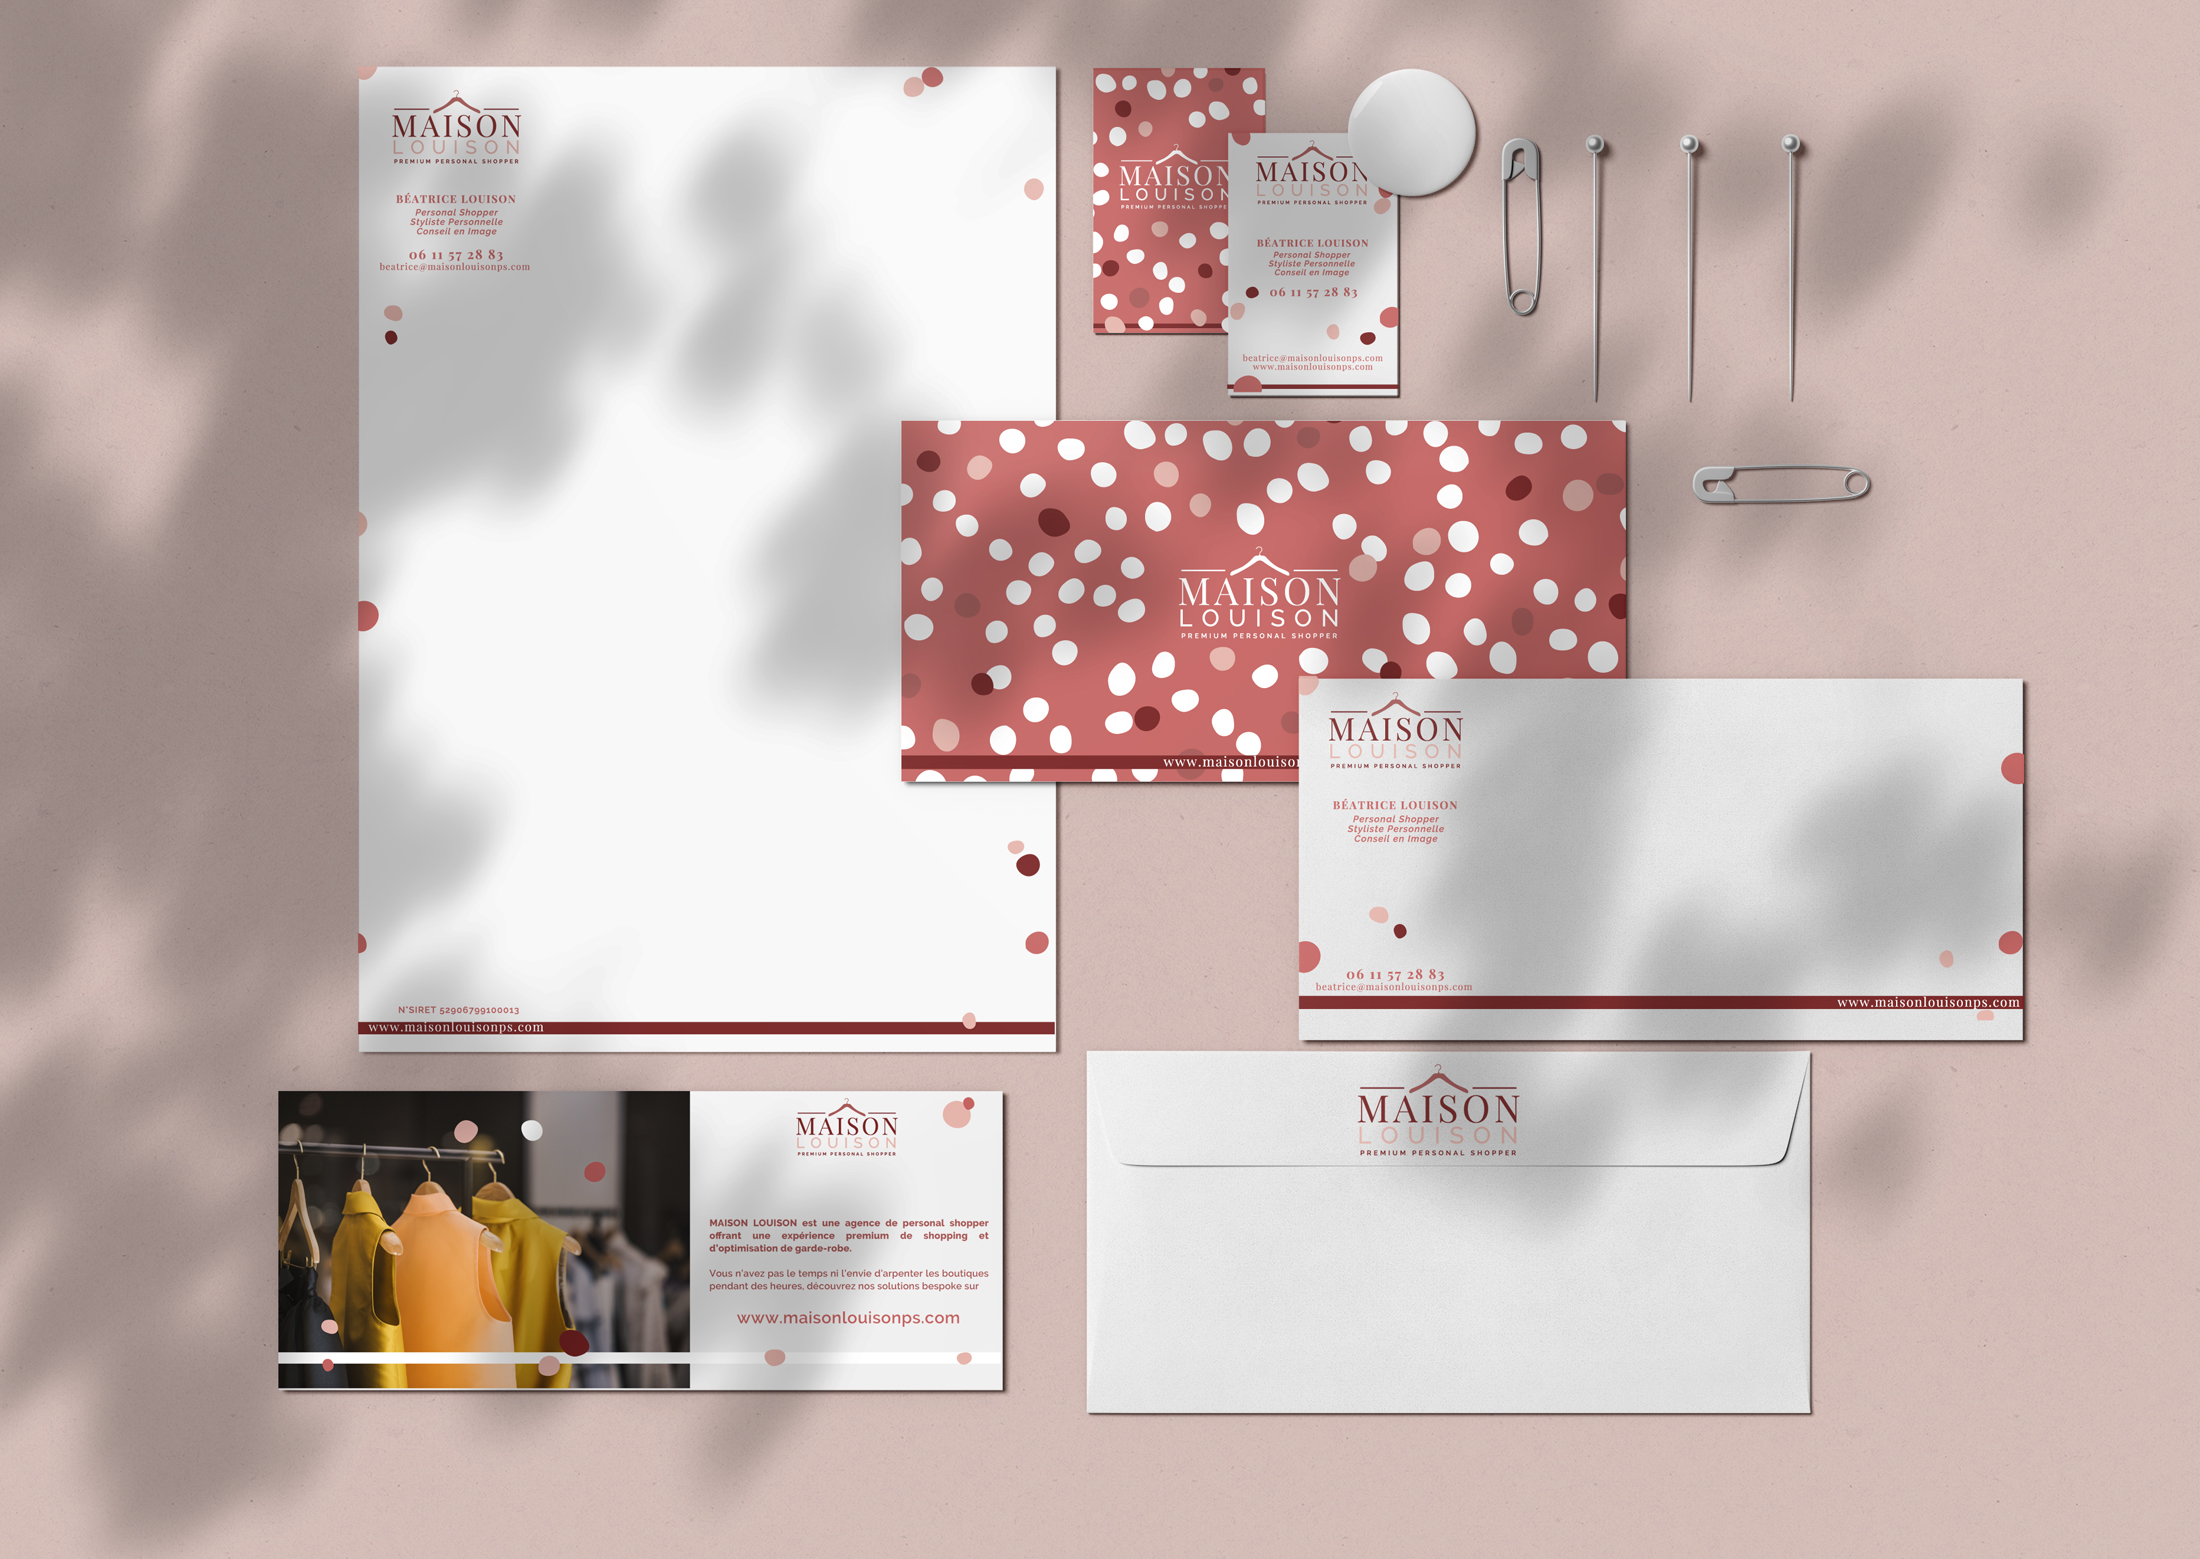 Branding marque maison louison Chic Studio